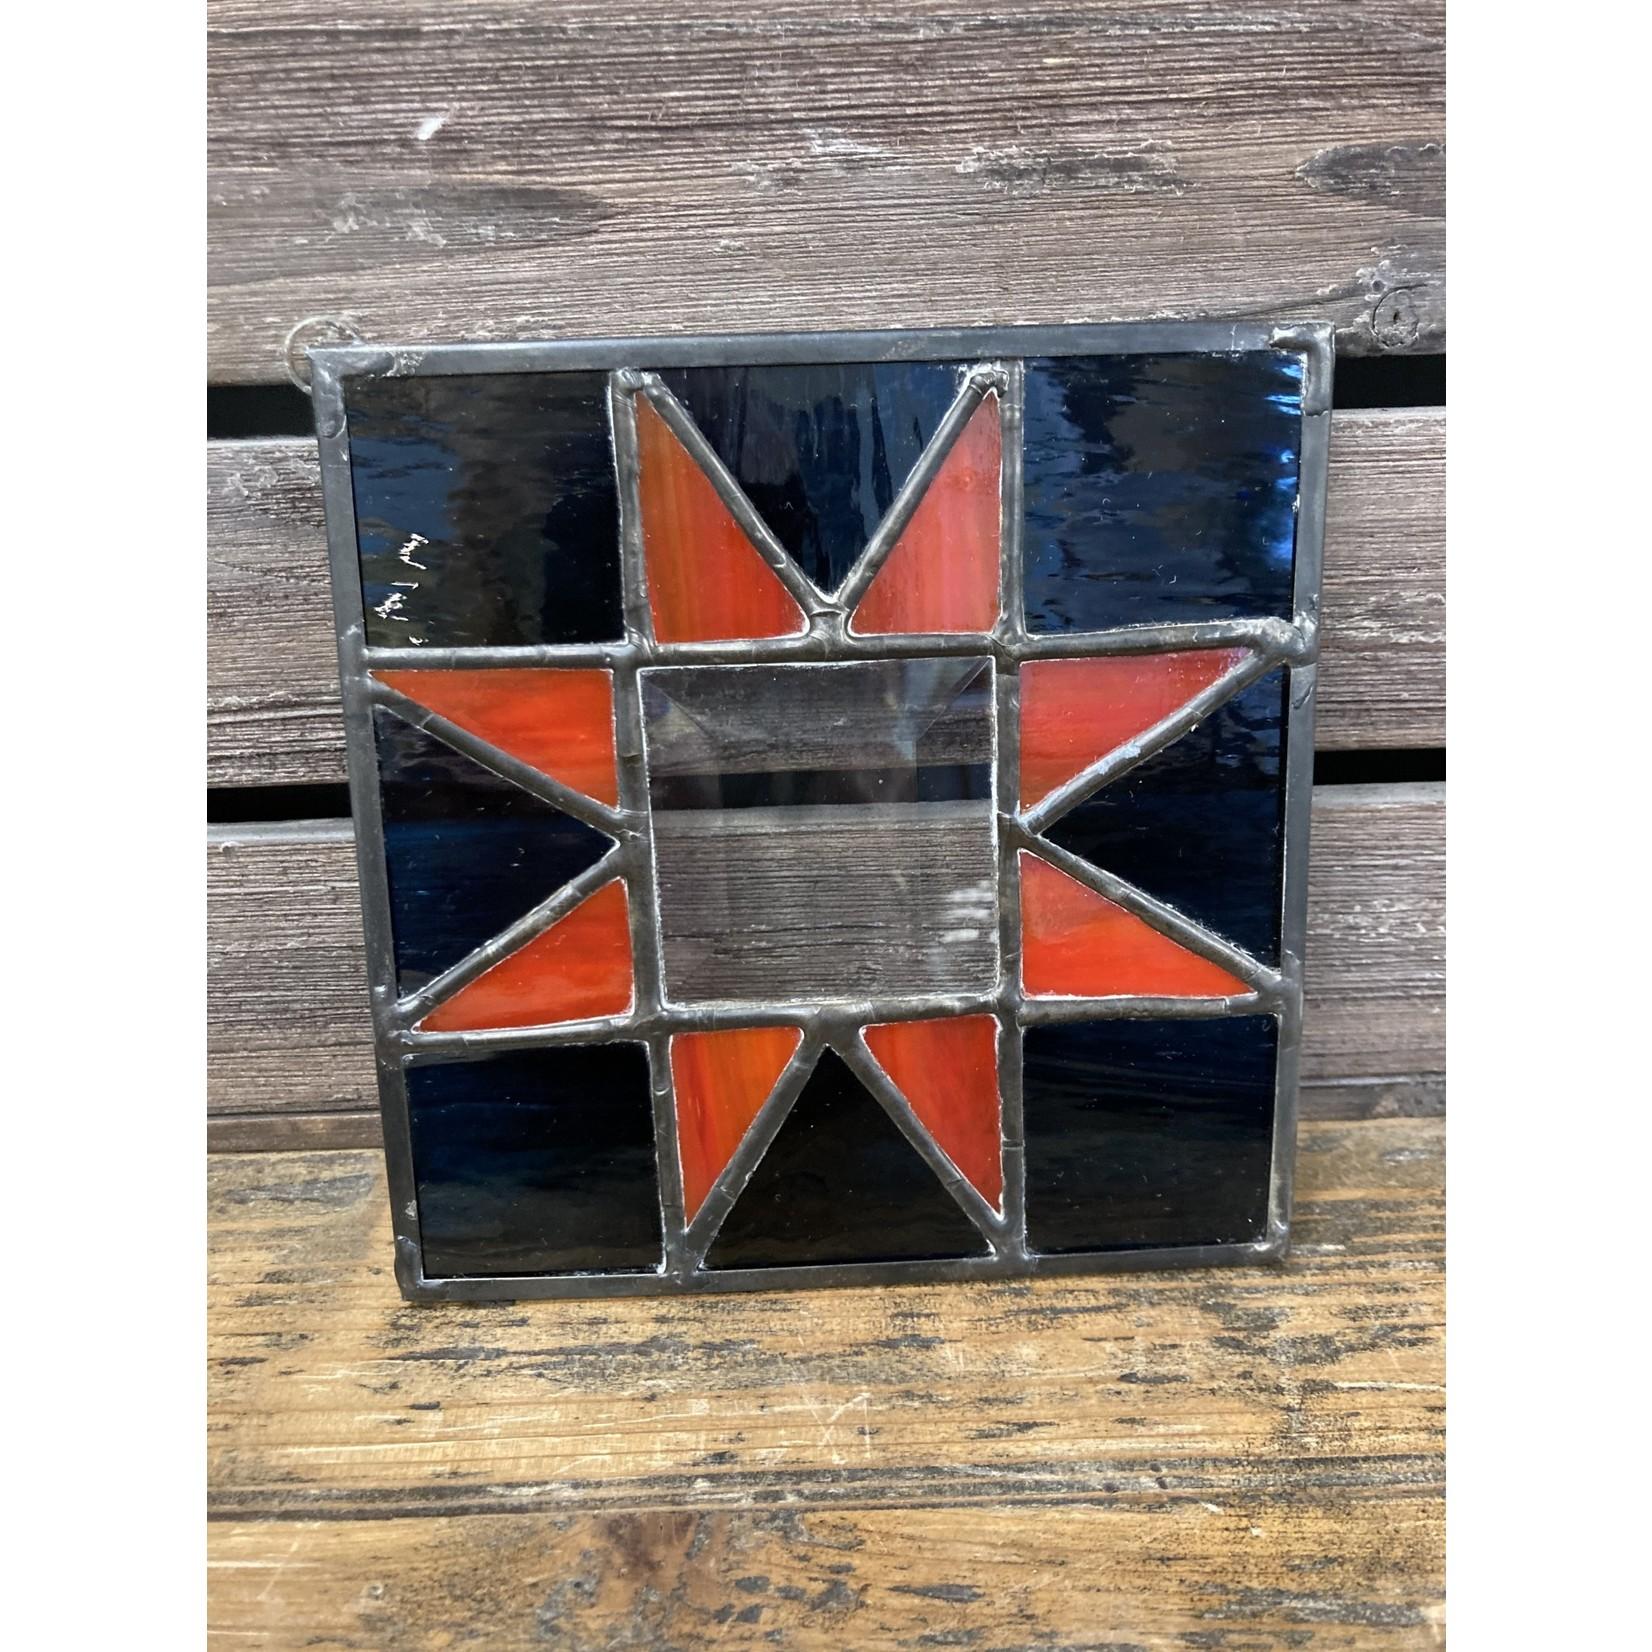 Blaine Leister Blaine Leister | 5 x 5 stained glass quilt 8 point star